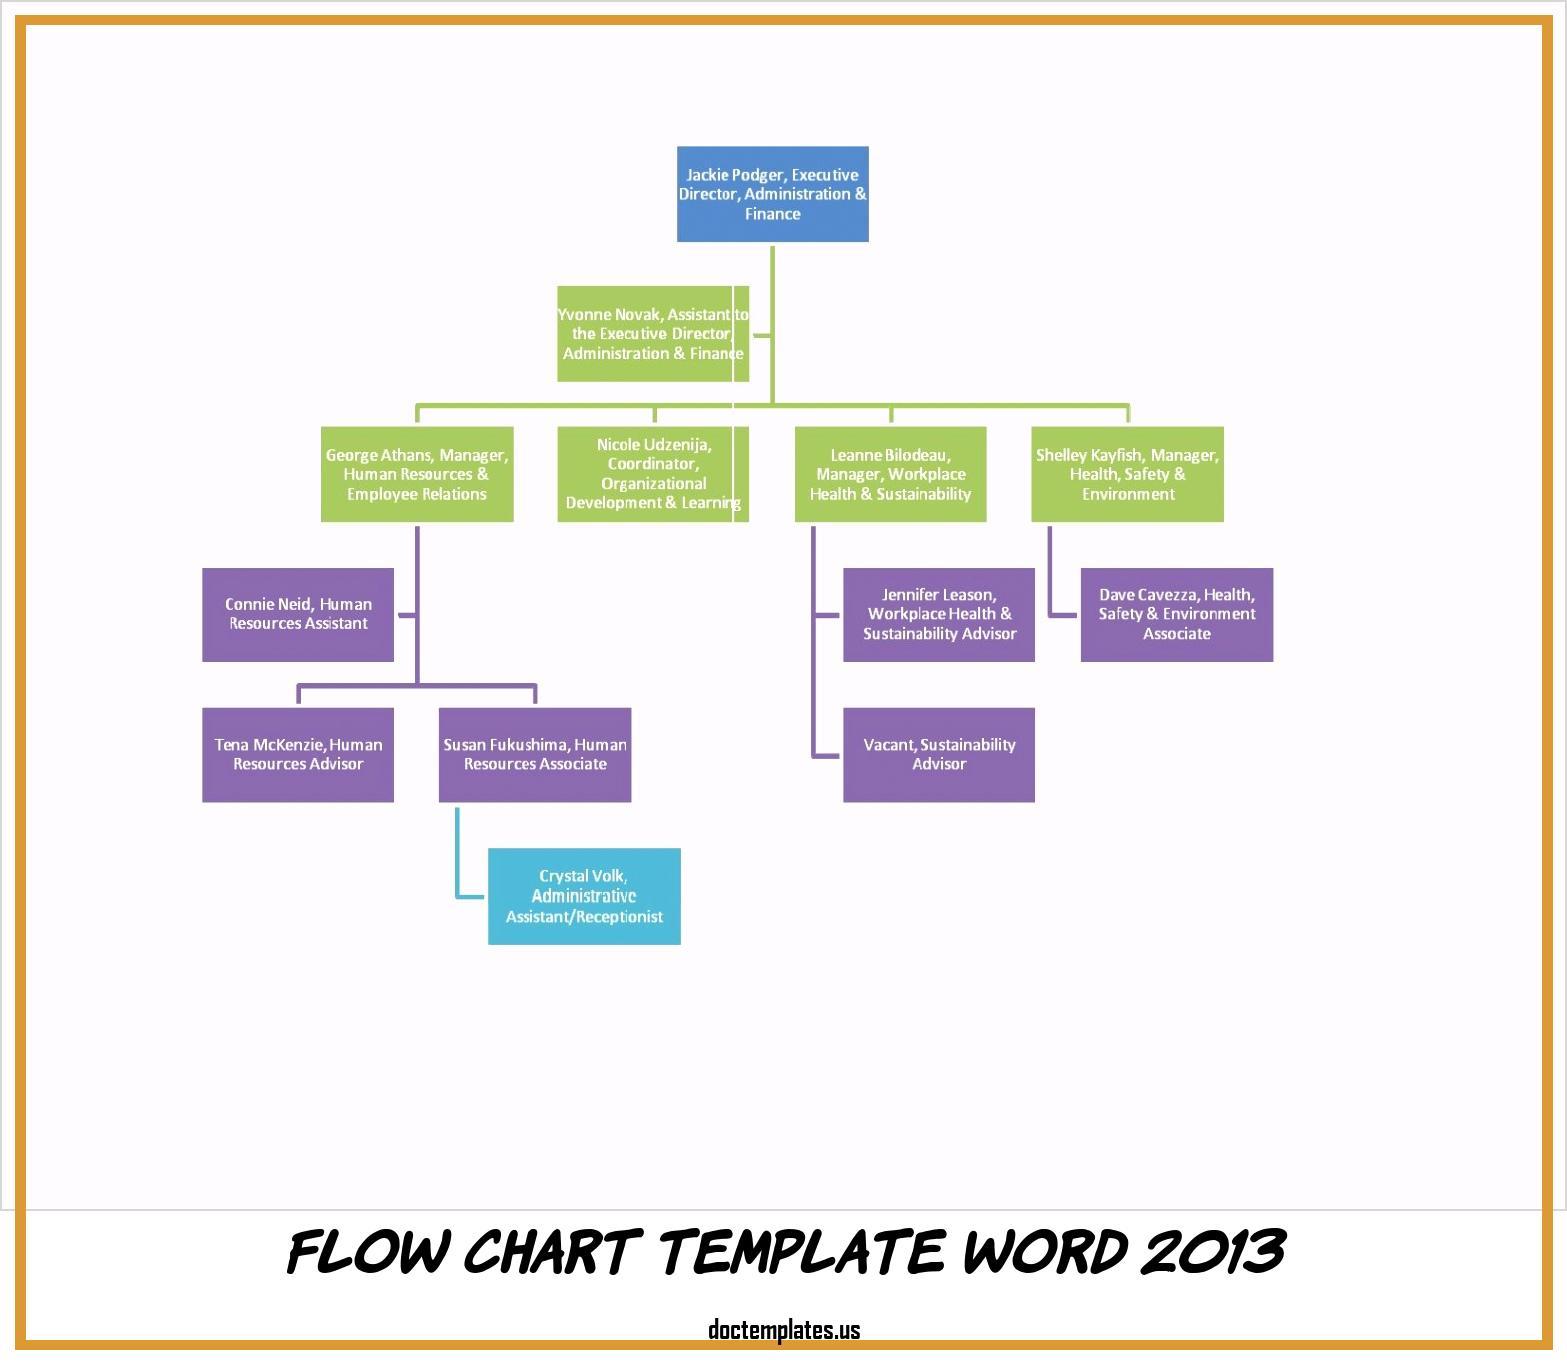 Flow Chart Template Word 2013 54587 Cvc1t 59 organizational Chart Template Word 2013 Pertaining Bjx@[o H G T E N B E B T D A S D F G H J K L O I U Y T R M N W C G T Y U X Z C C X Z A S Q W D D A J H H U I K J T U F I E F D W H I O C P L O K I U J M N H Y T R F V C D E W S X Z A Q S Z X C V B N M N B V C C X Z A Q W E E D C V T